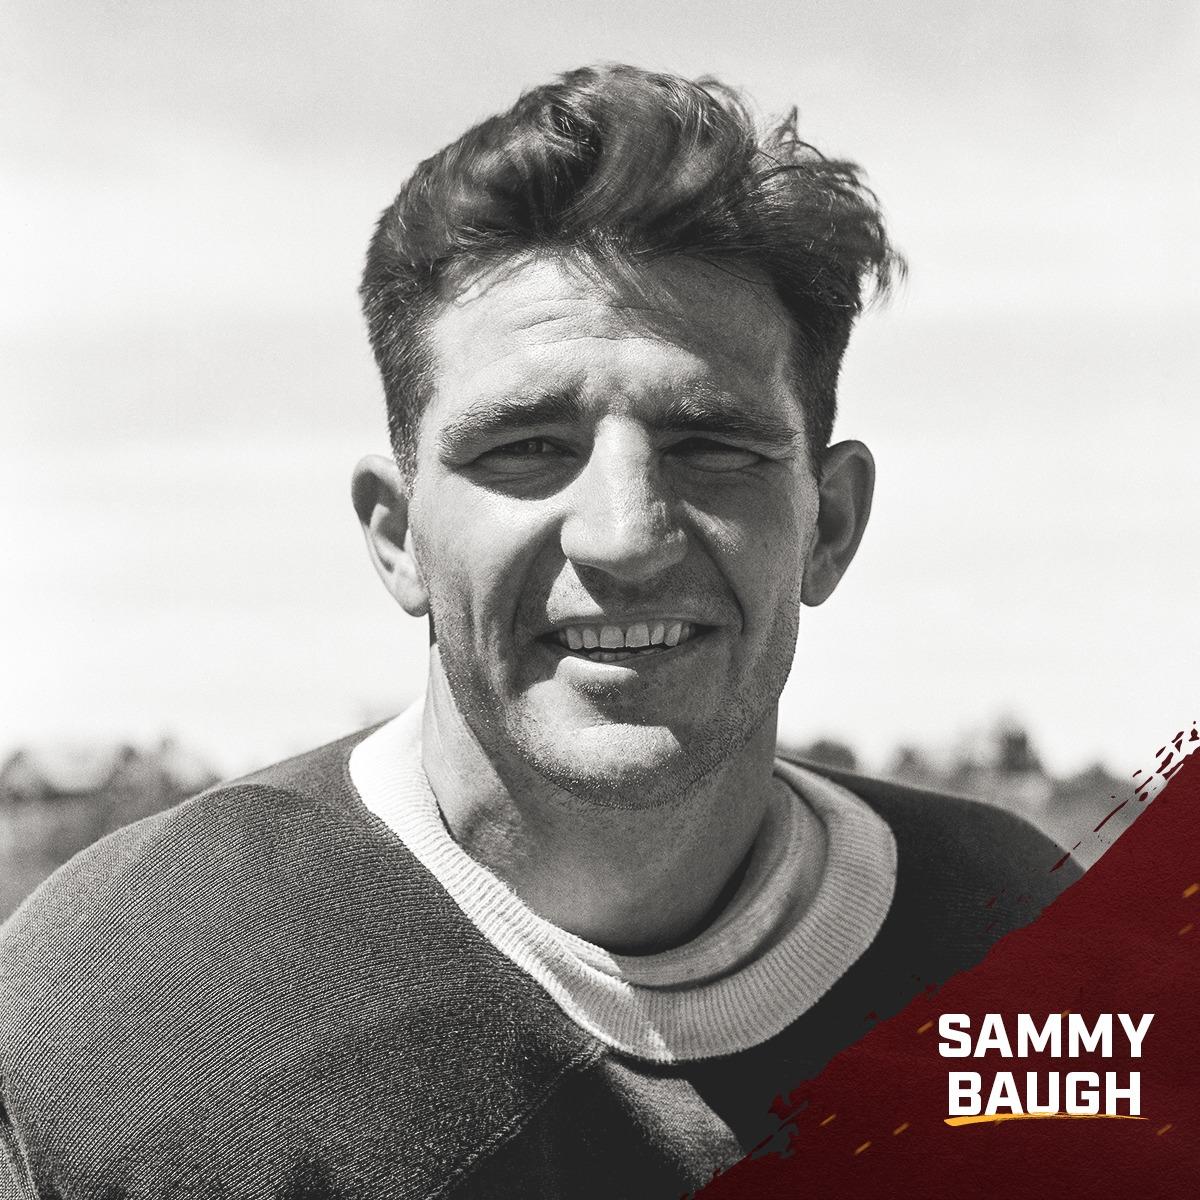 Sammy Baugh Tribute